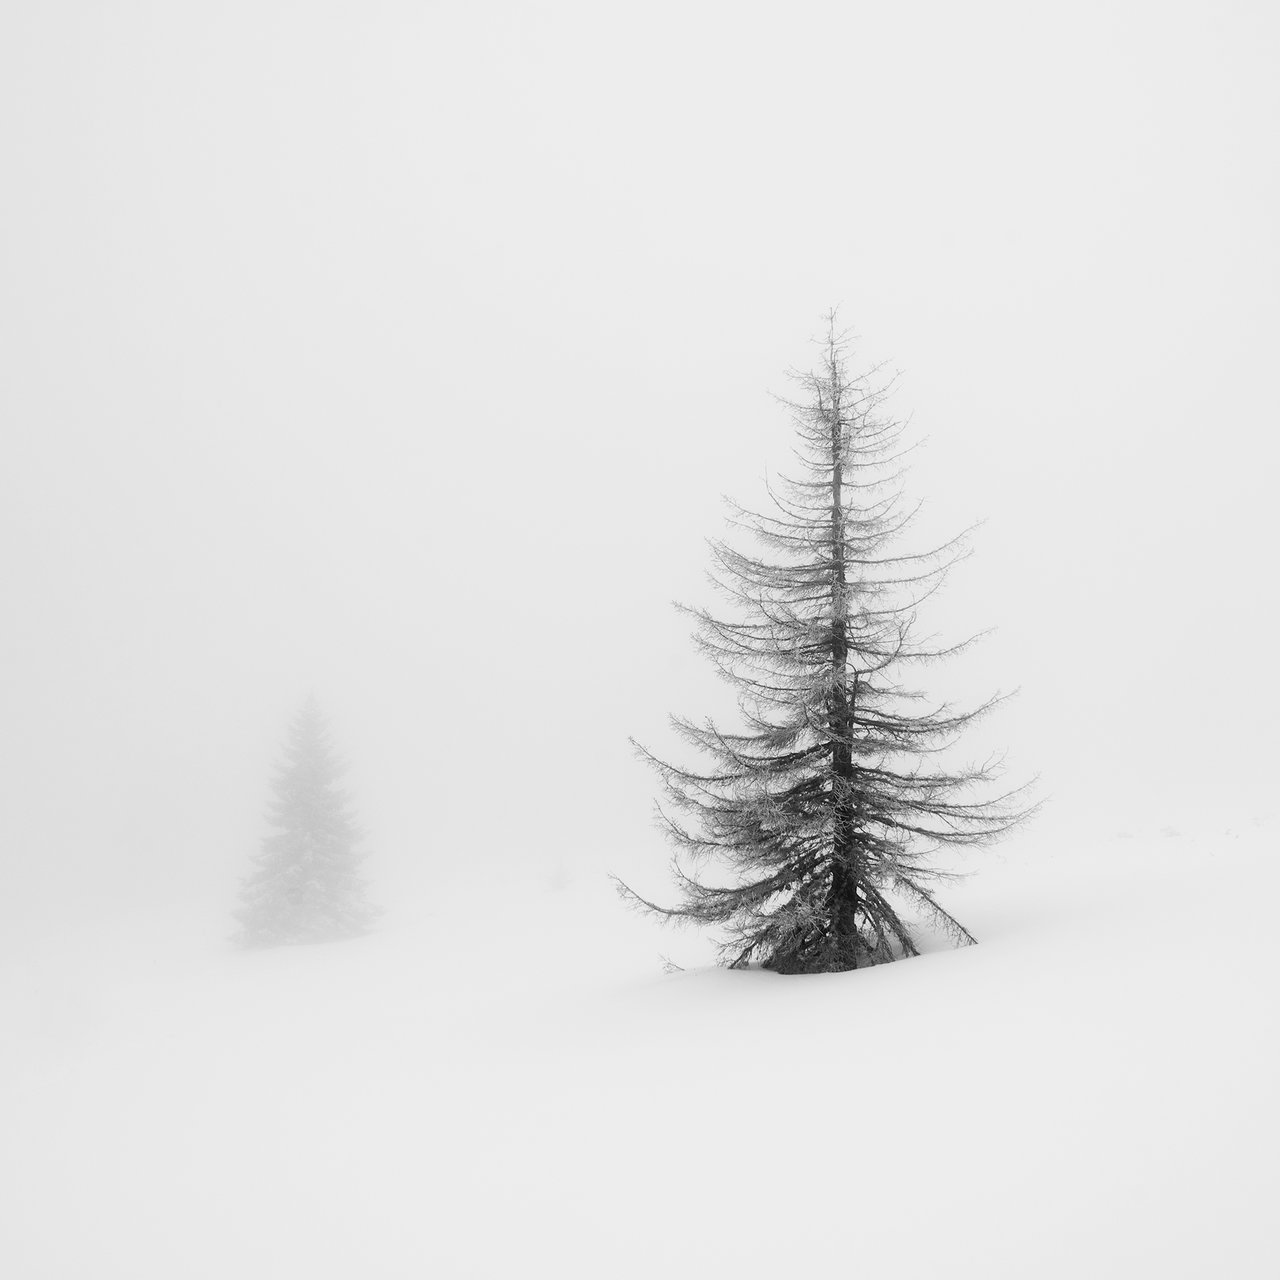 Витоша 1/2 | Author Emil Rashkovski - brutas | PHOTO FORUM